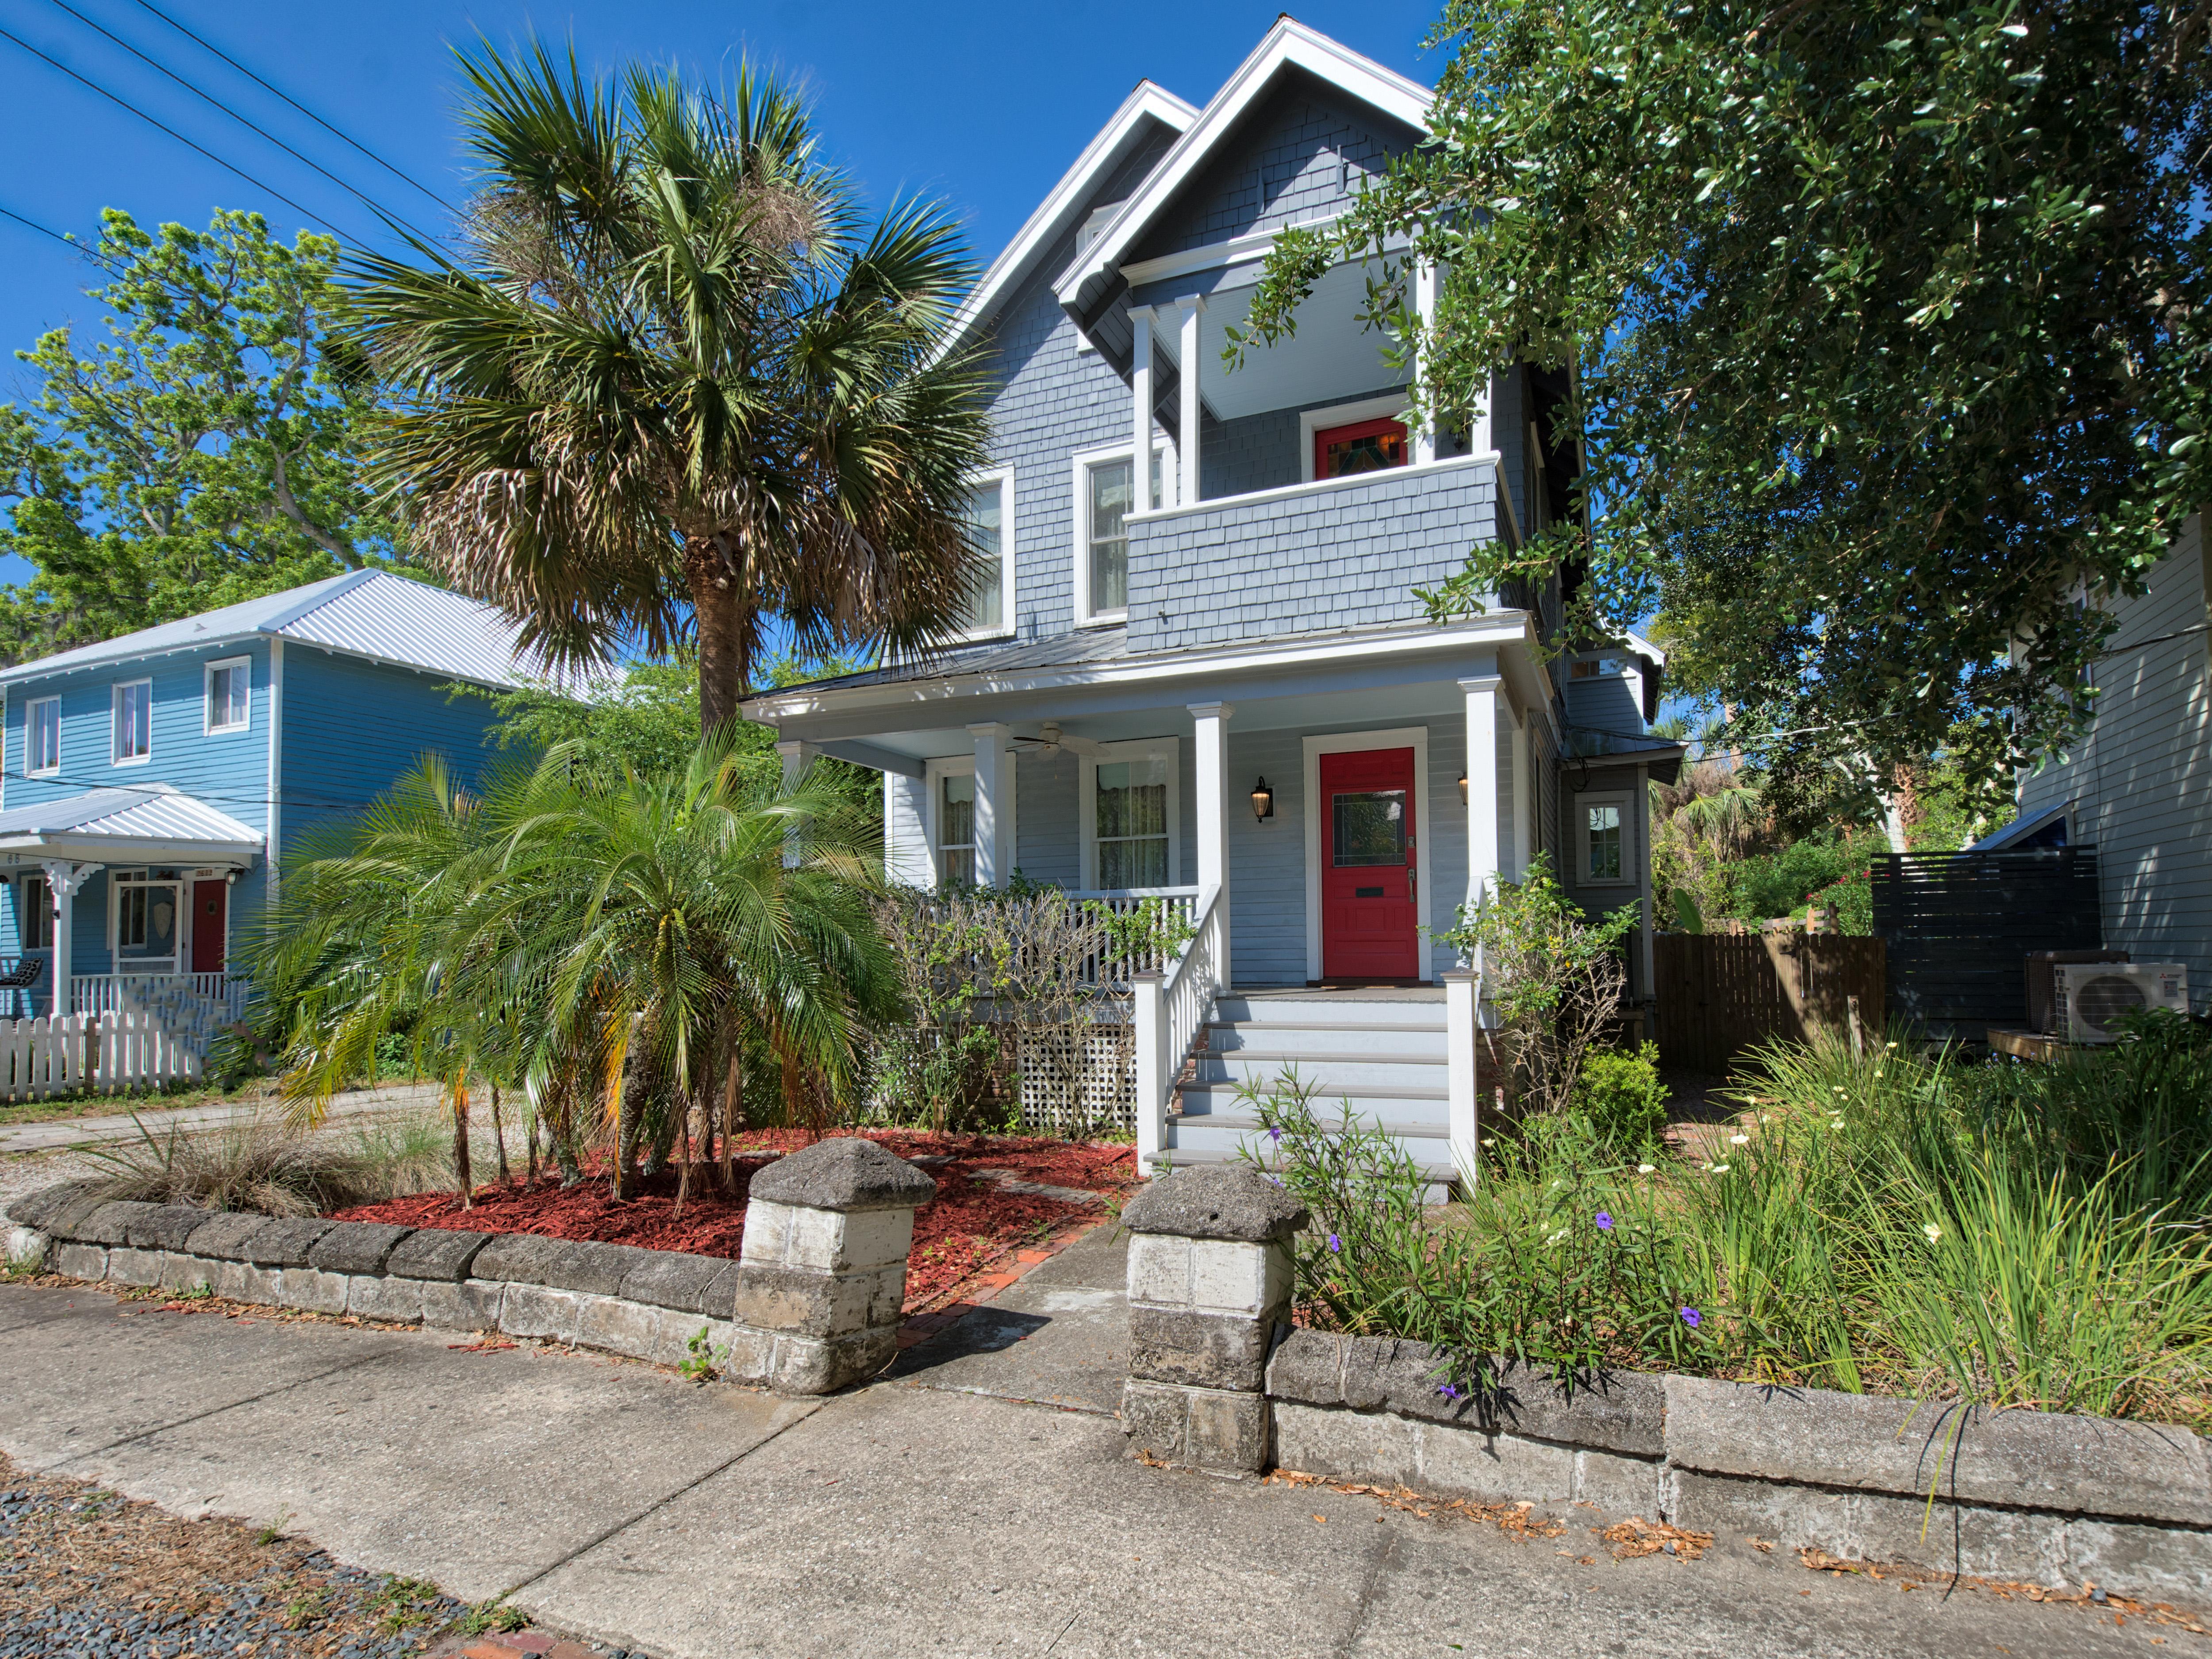 St. Augustine FL Vacation Rental Enter your rental